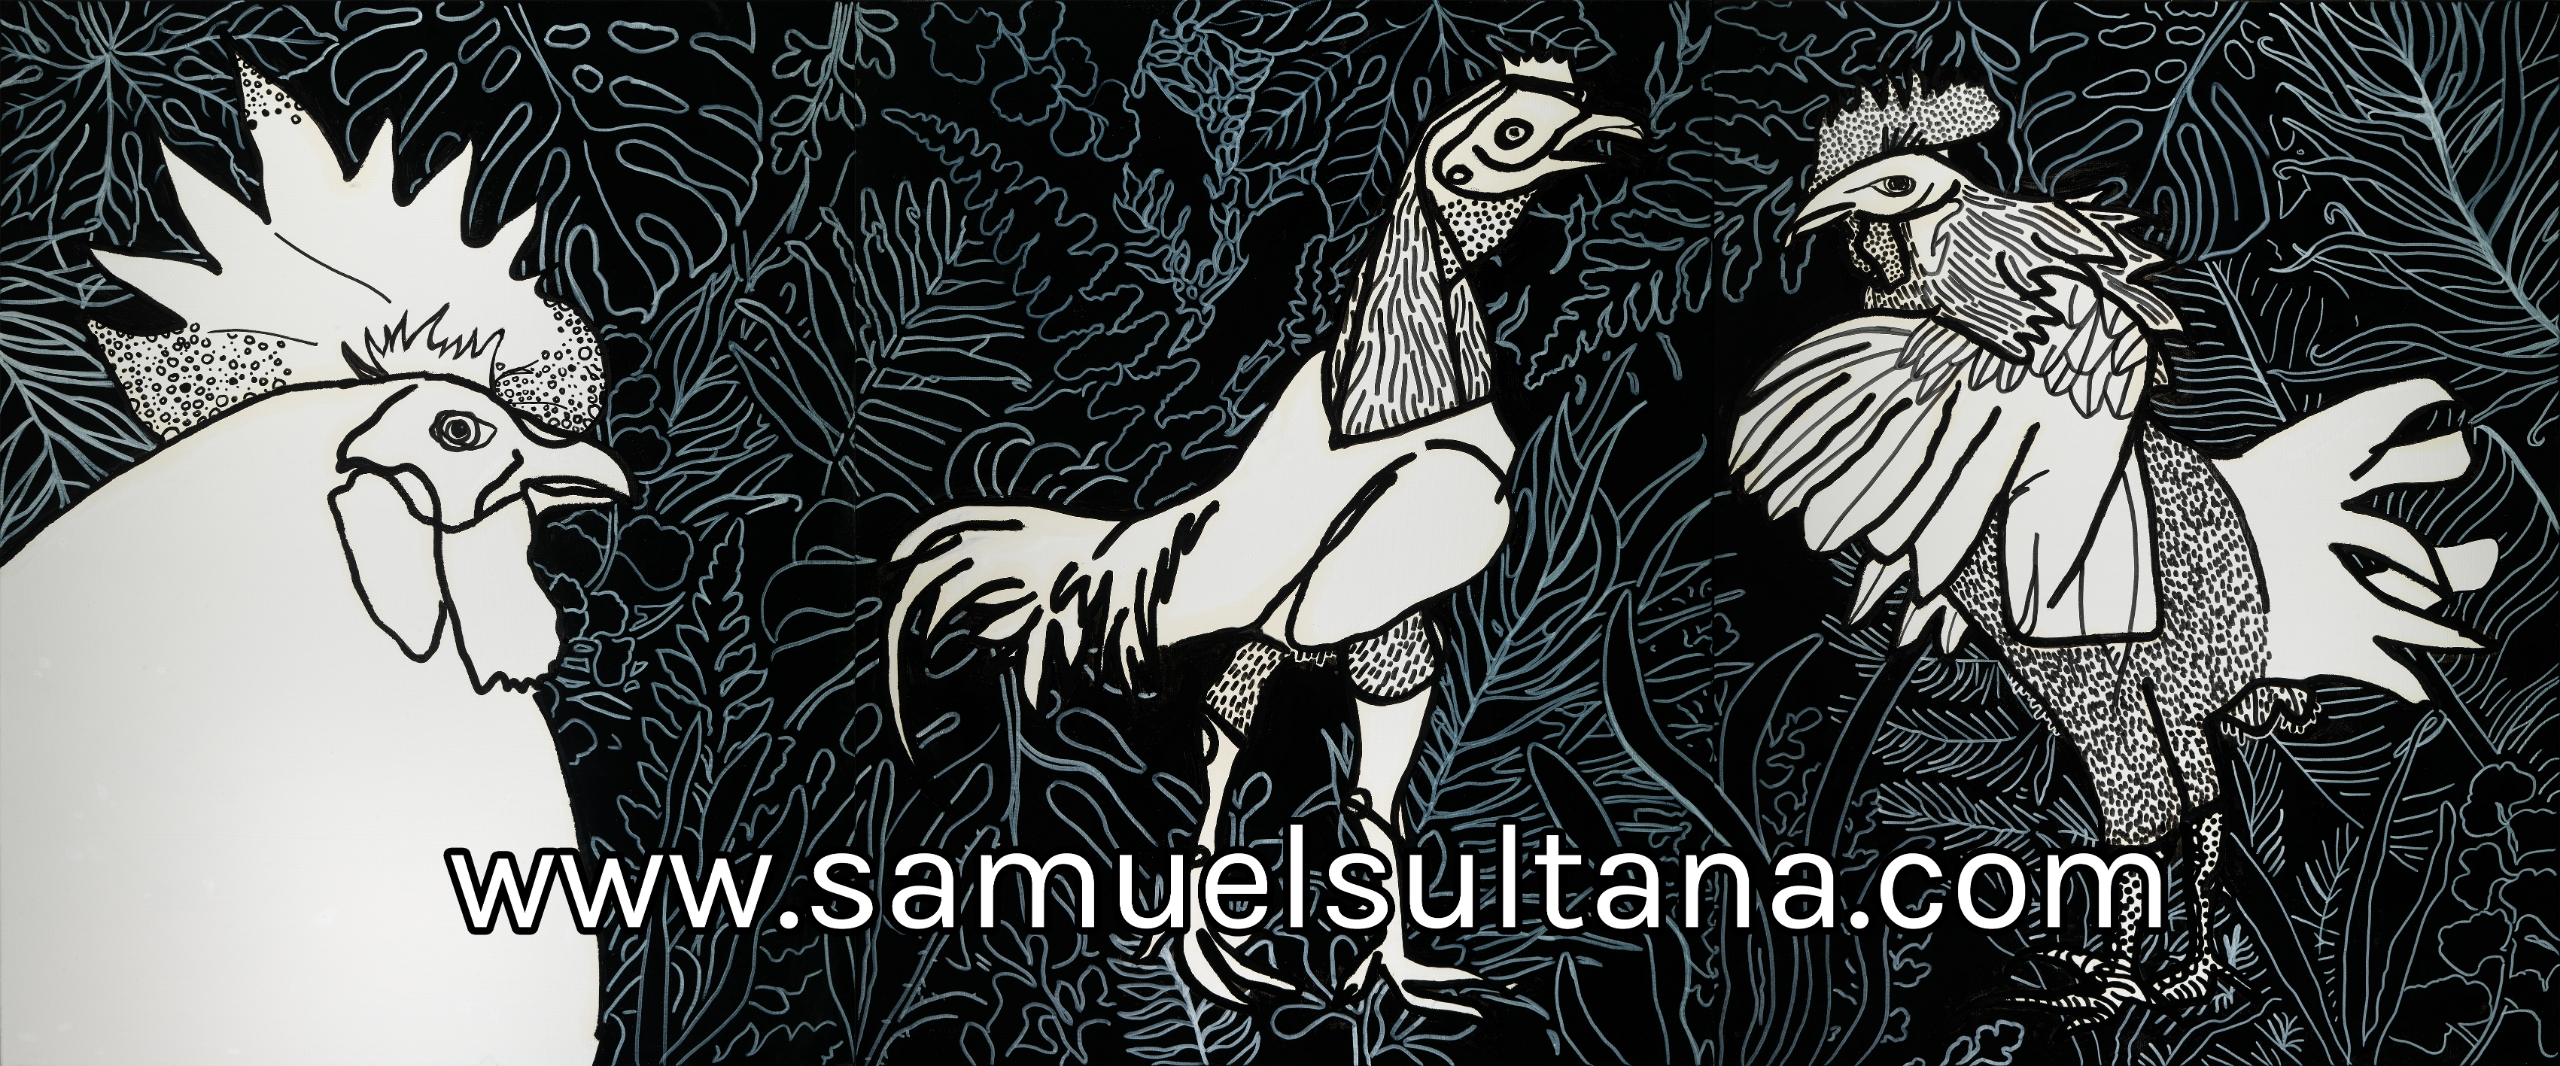 Samuel Sultana (@samuelsultana) Cover Image